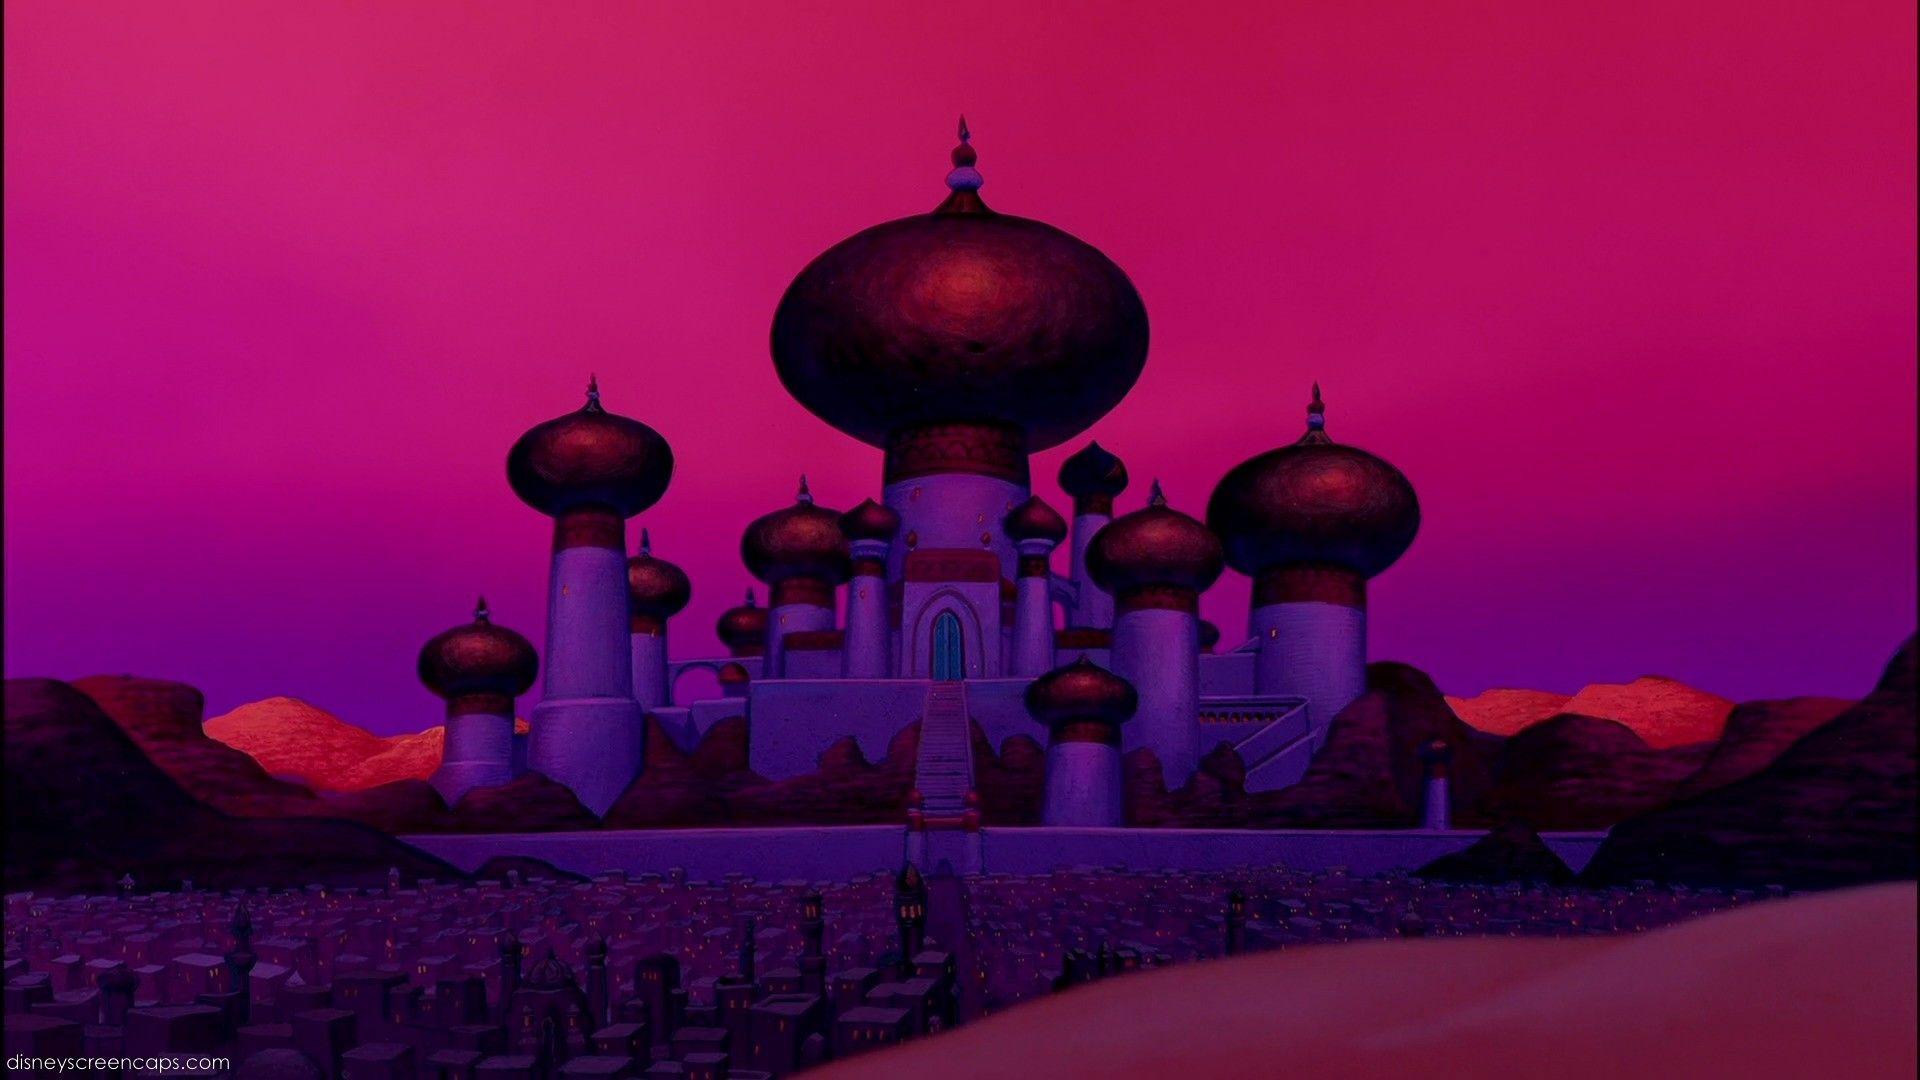 Empty Backdrop From Aladdin Disney Crossover 30293071 1920